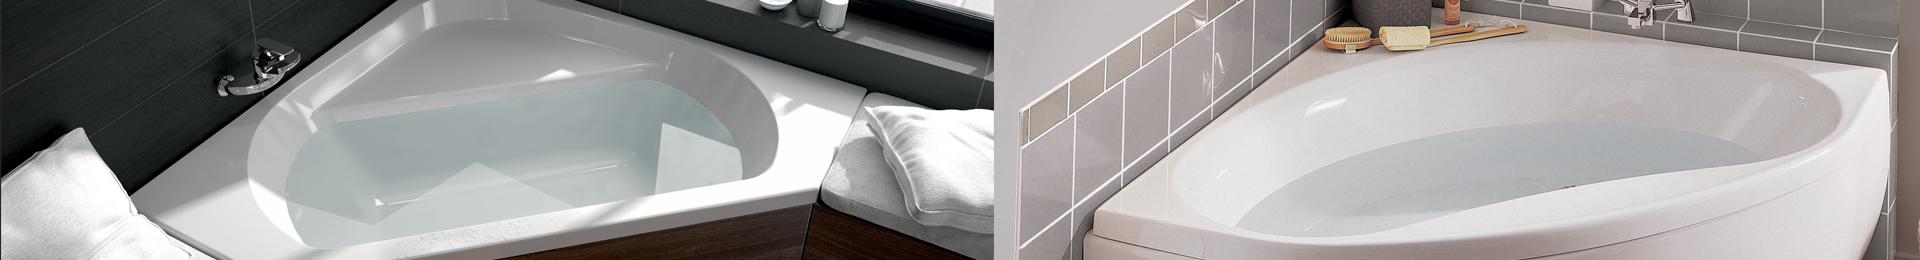 baignoire angle 120x120. Black Bedroom Furniture Sets. Home Design Ideas